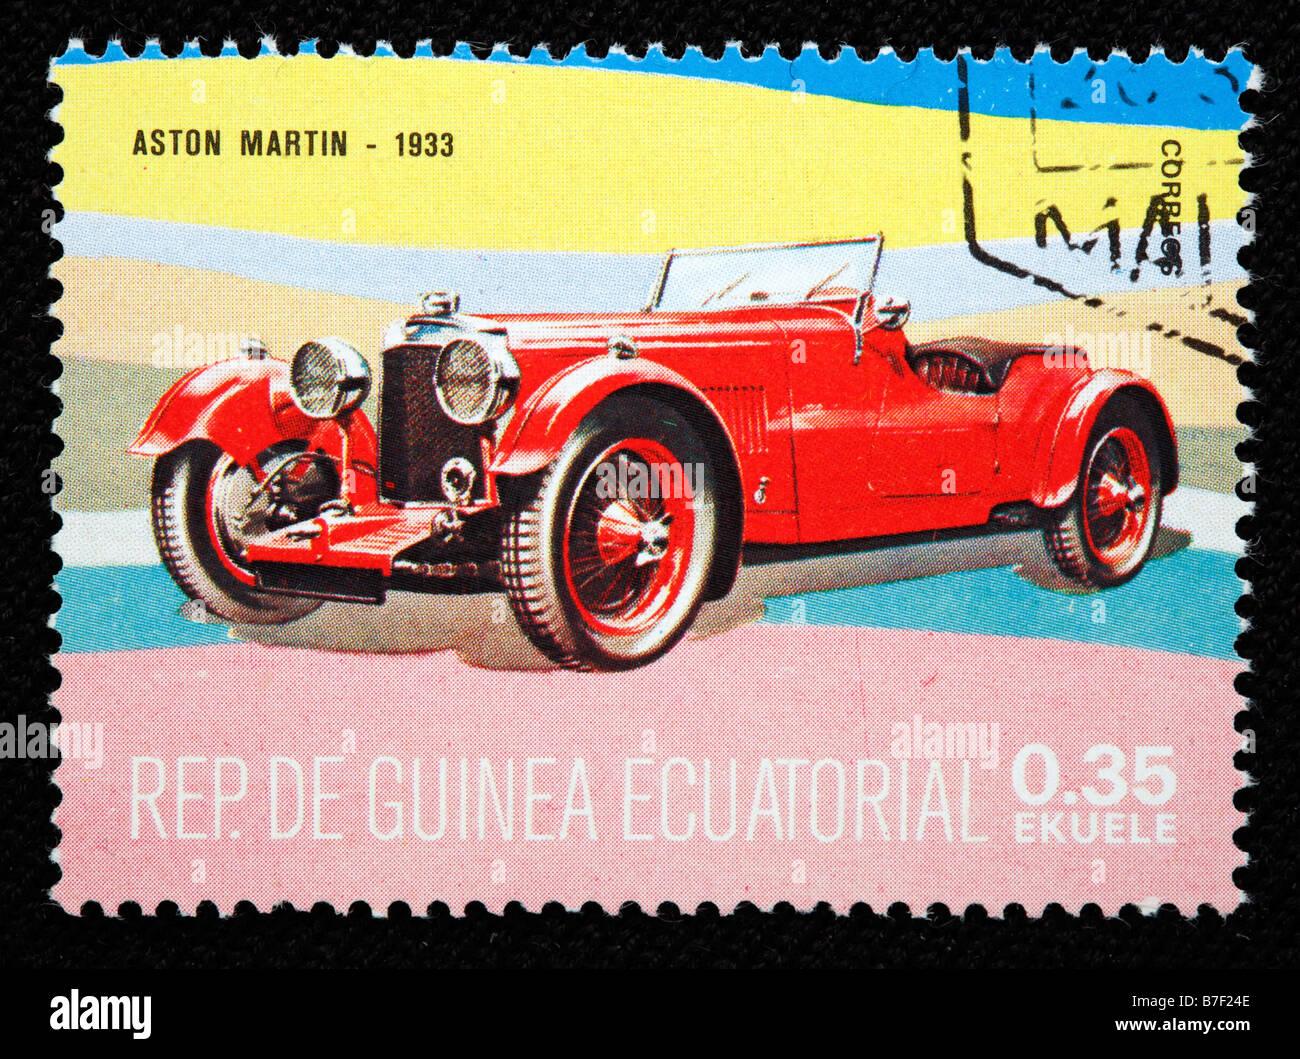 Geschichte des Verkehrs, Auto Aston Martin (1933), Briefmarke, Äquatorial-Guinea Stockbild